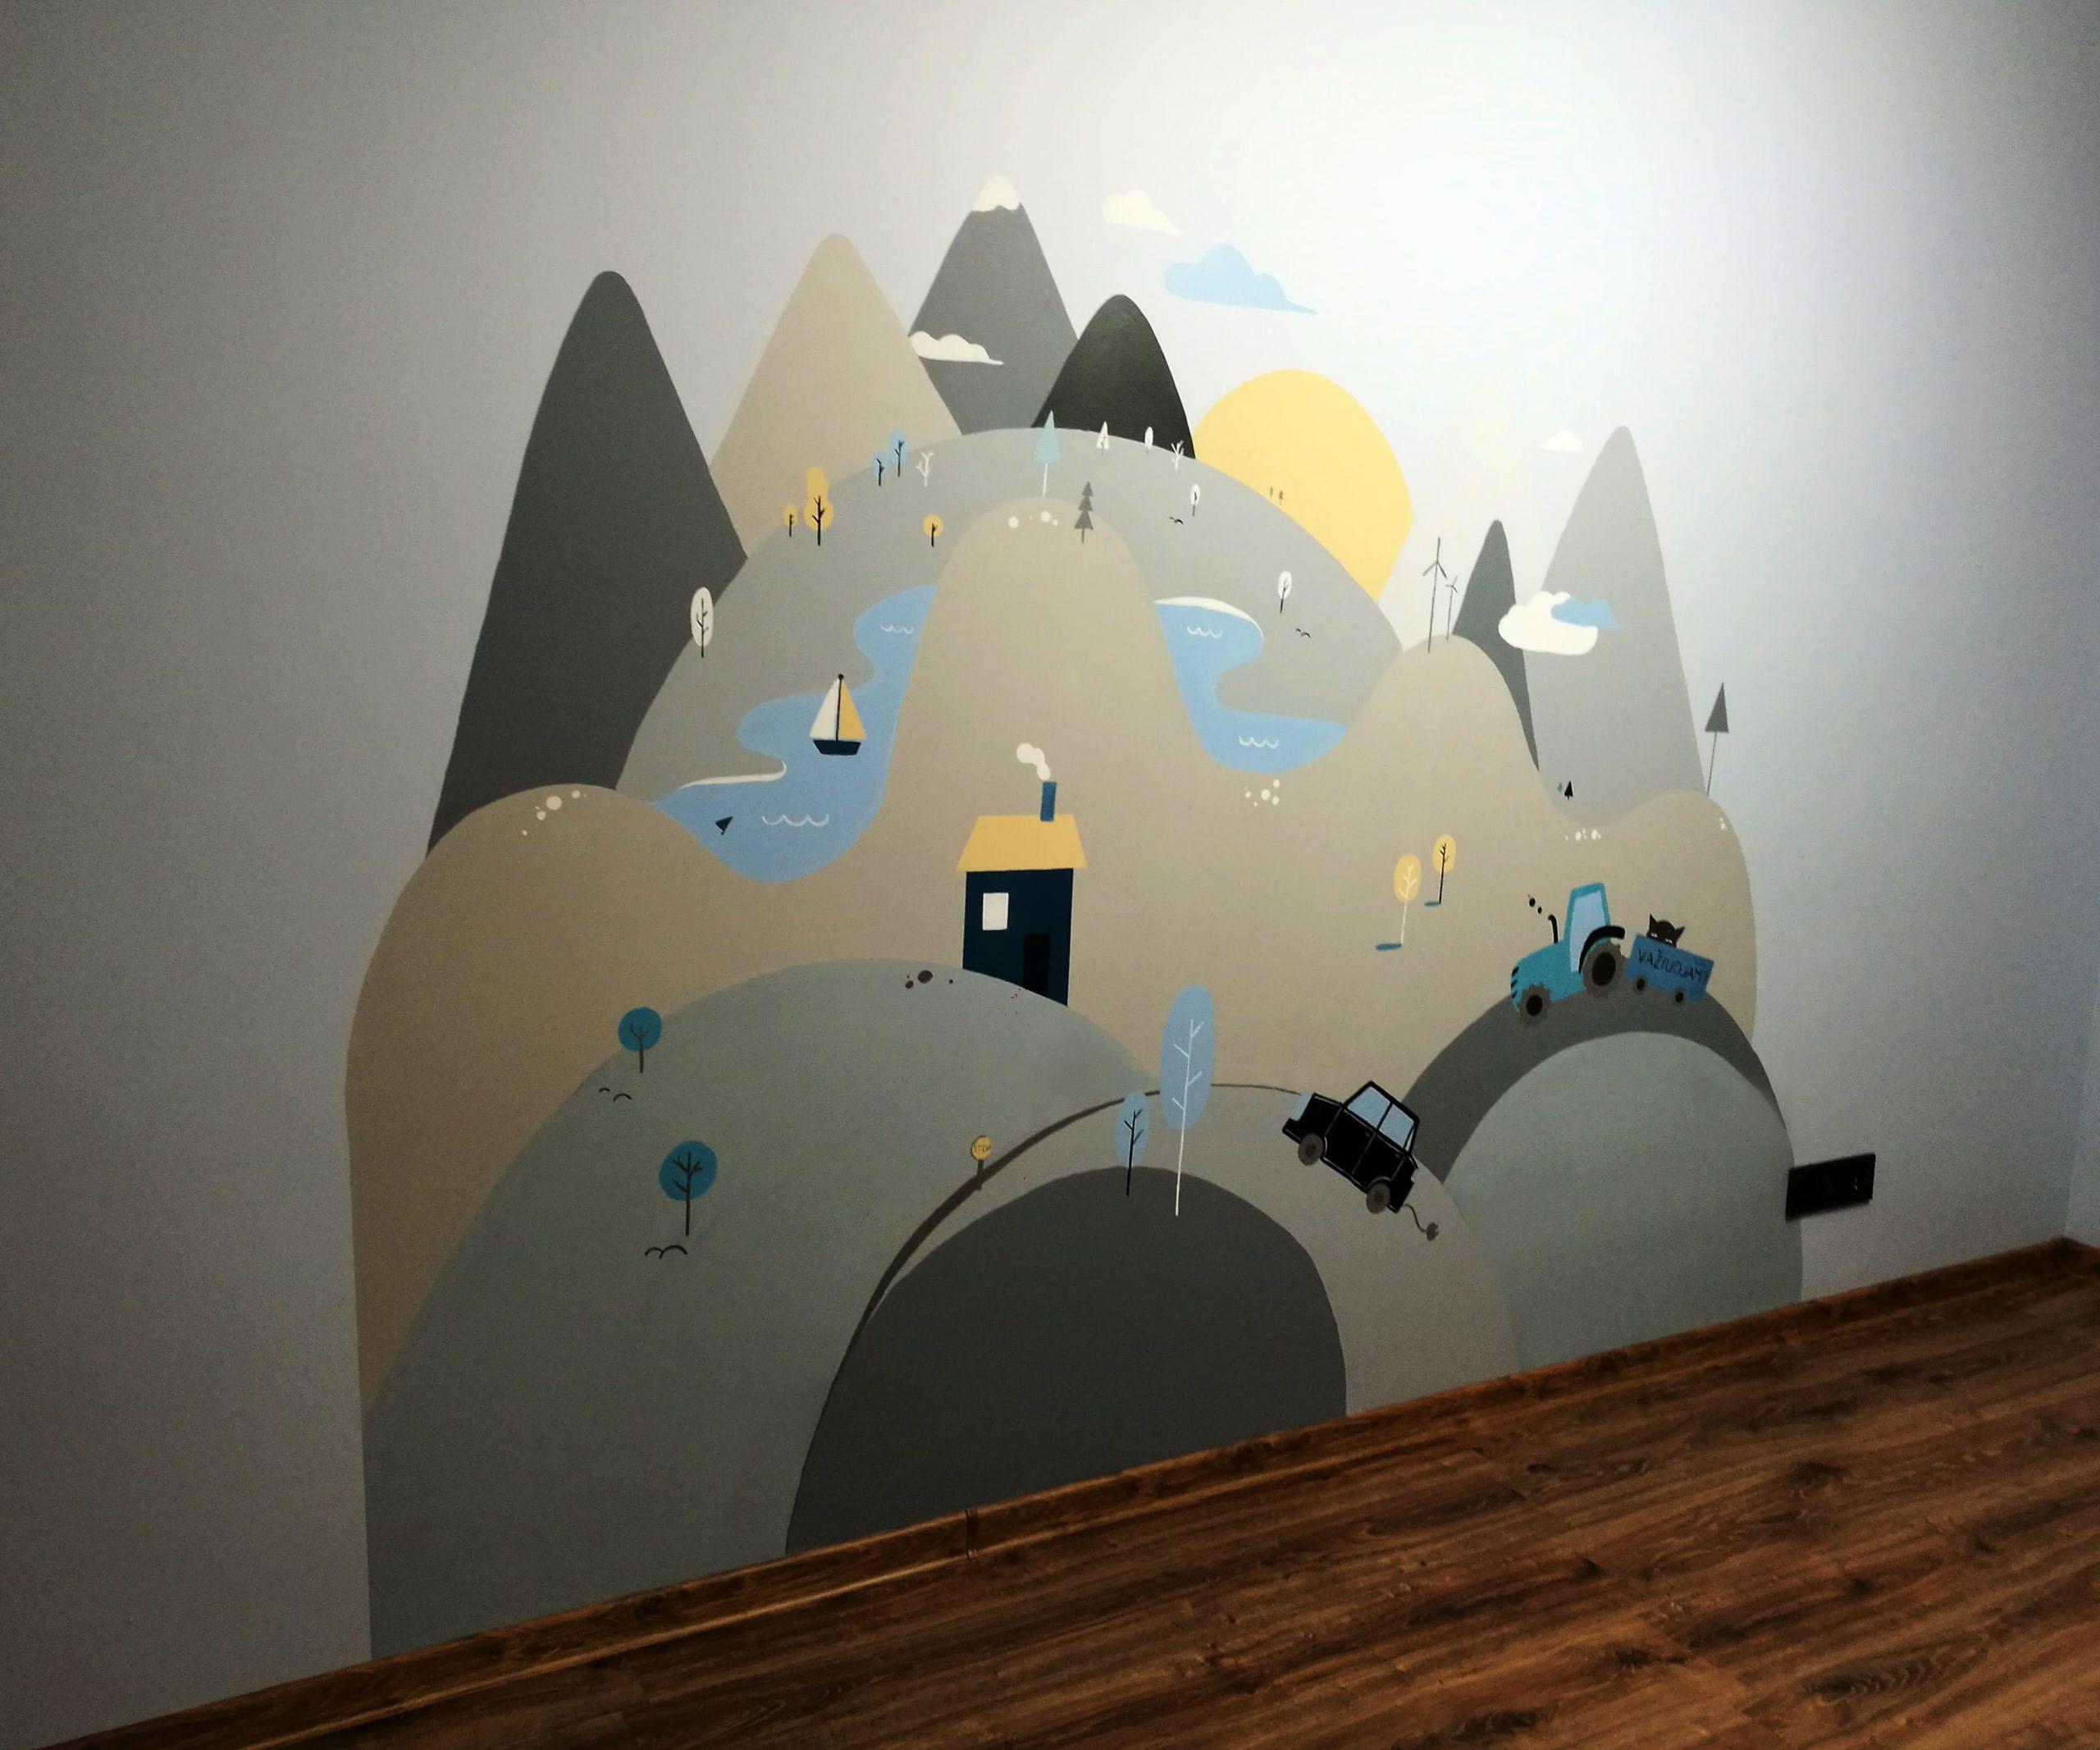 menine-kuryba-sienu-dekoravimas (26)